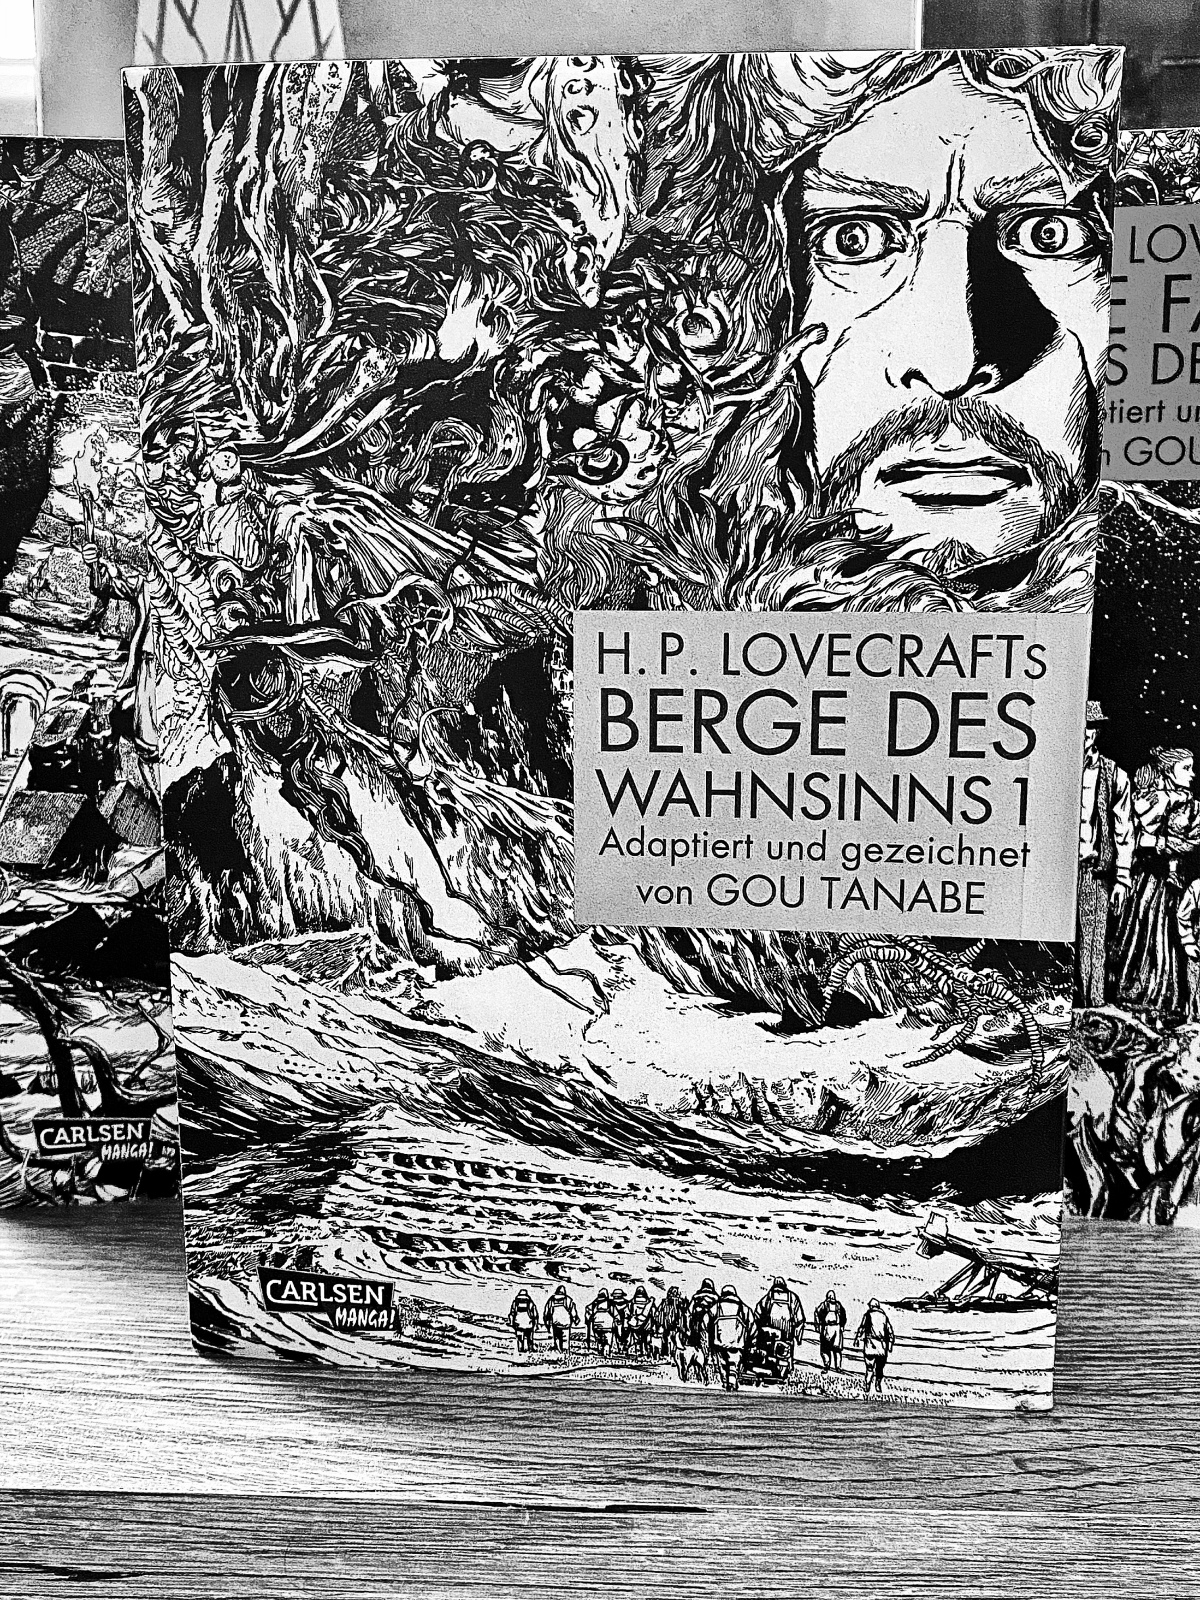 H.P. Lovecrafts Berge des Wahnsinns Teil 1 | Review [Rezensionsexemplar]